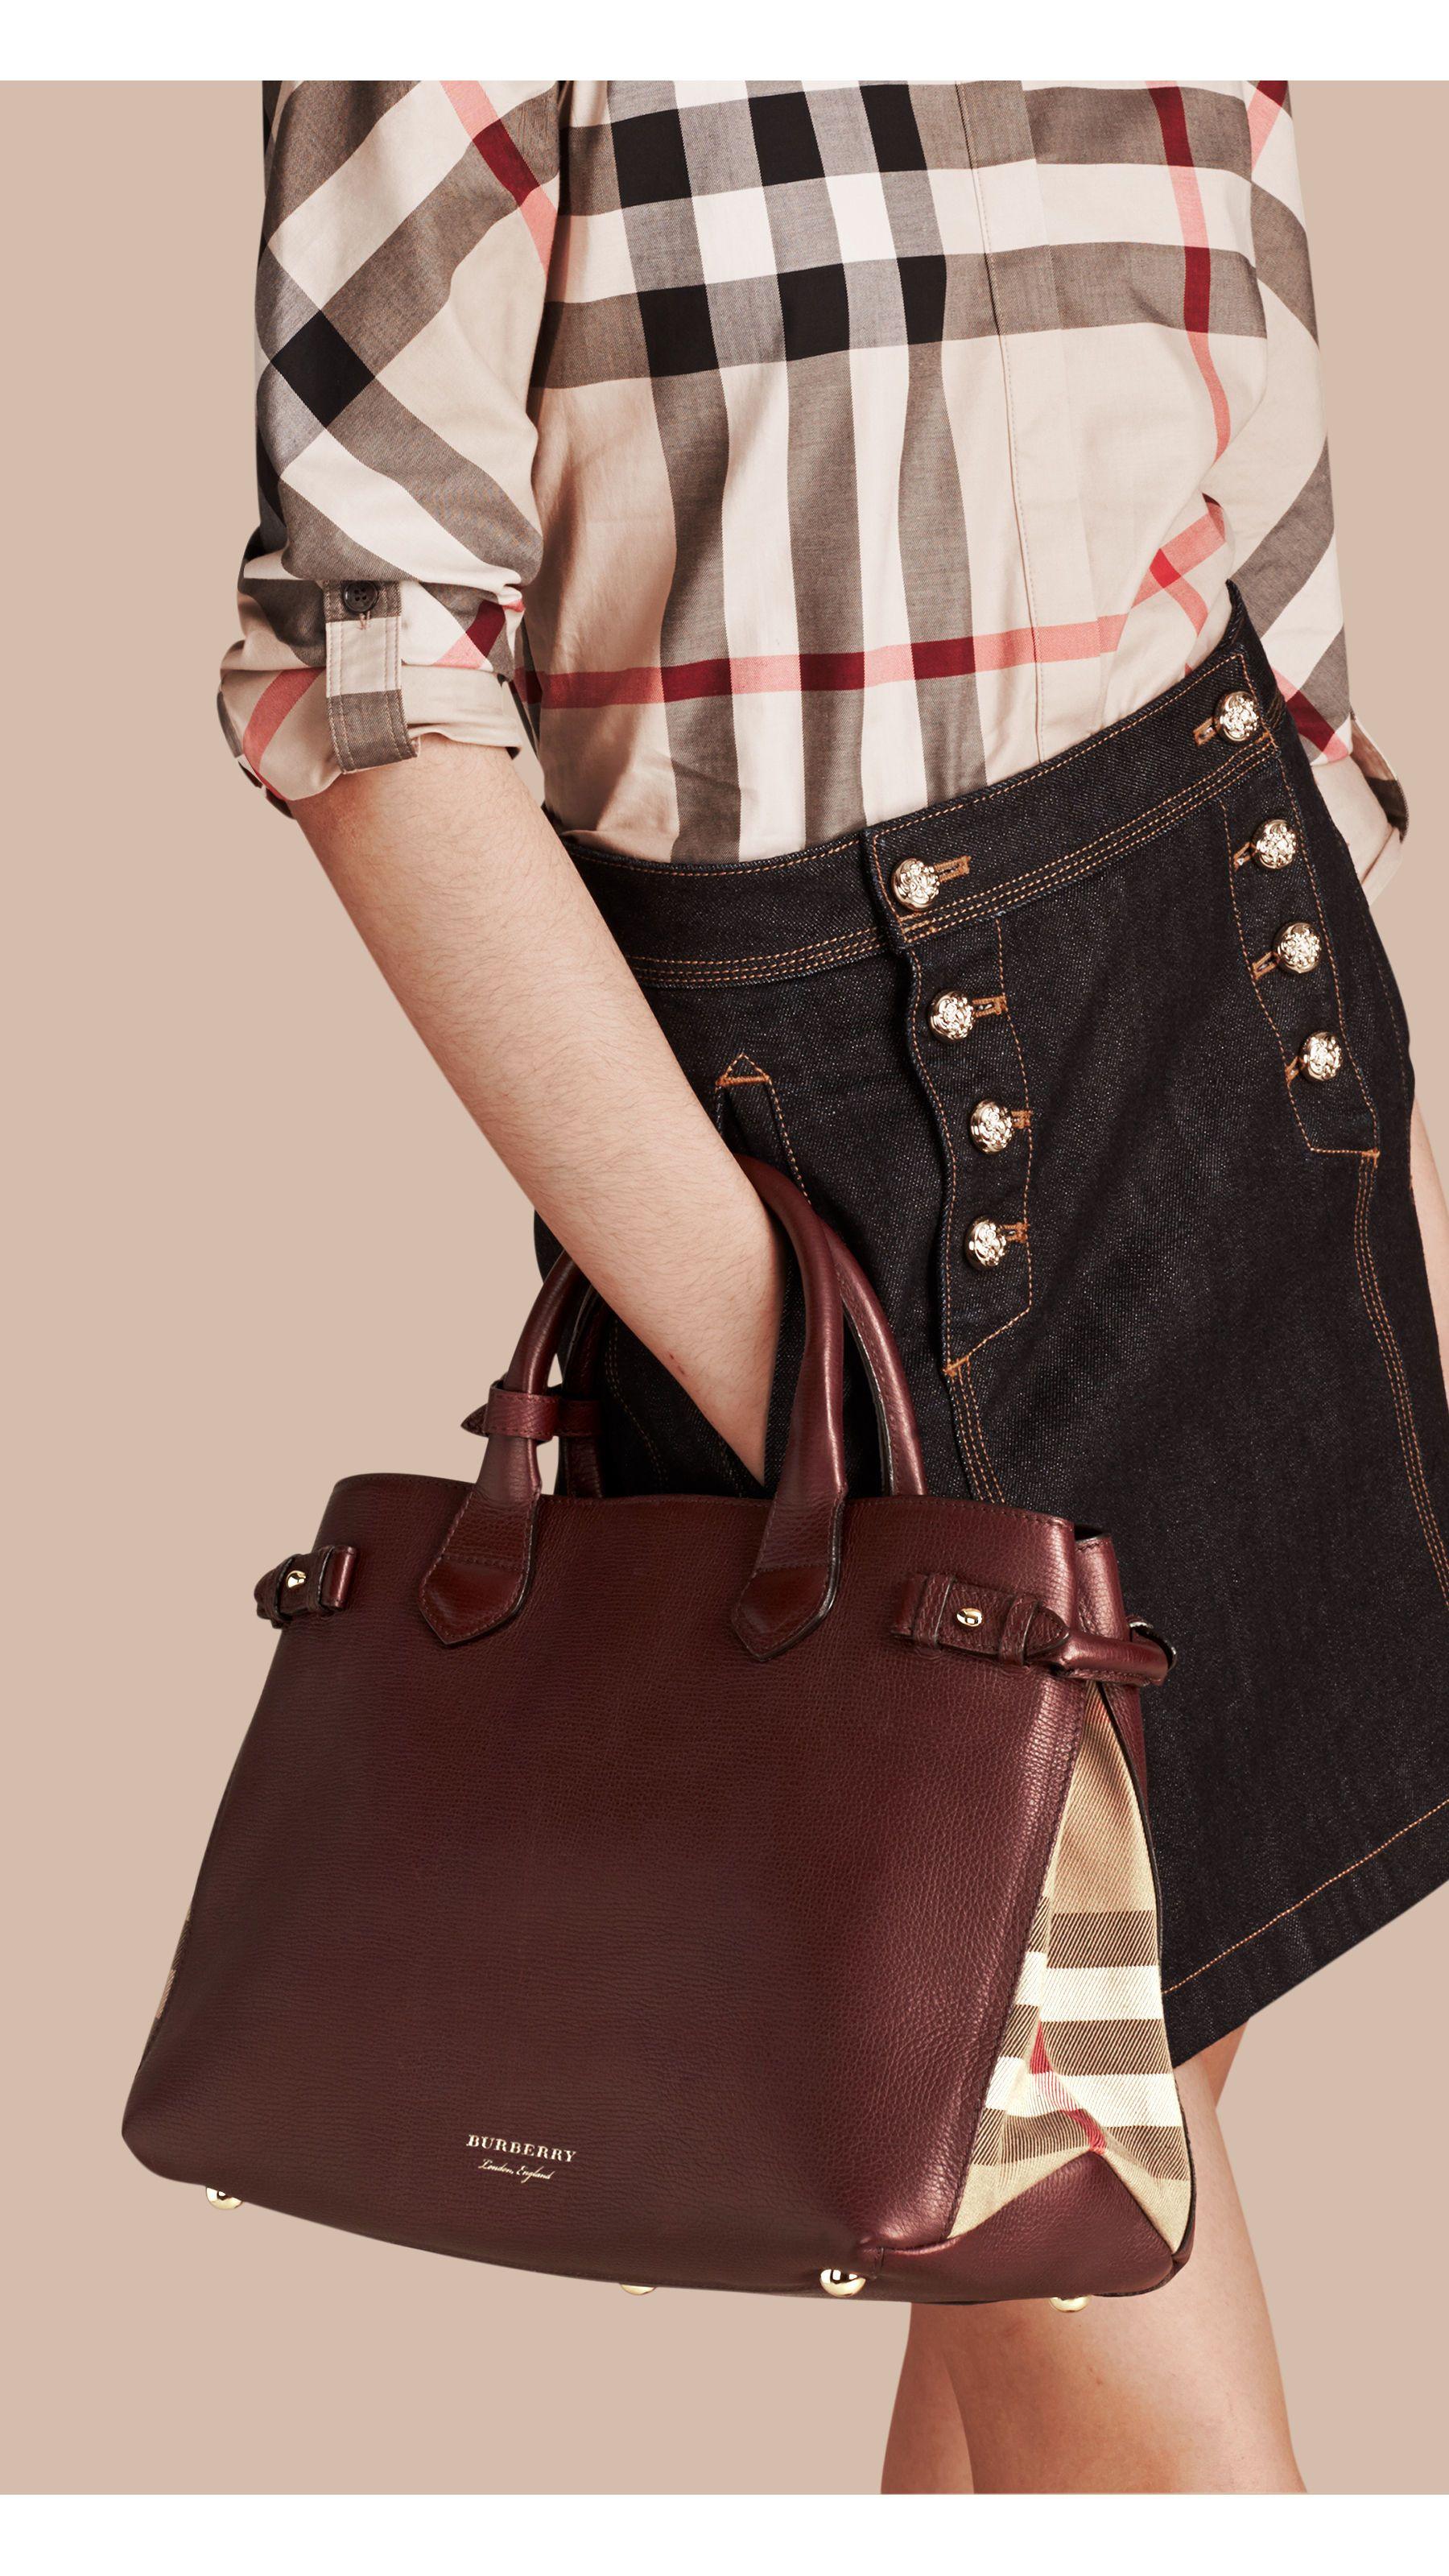 90187c84e Women's Handbags & Purses in 2019 | fav | Burberry, Handbags, Leather